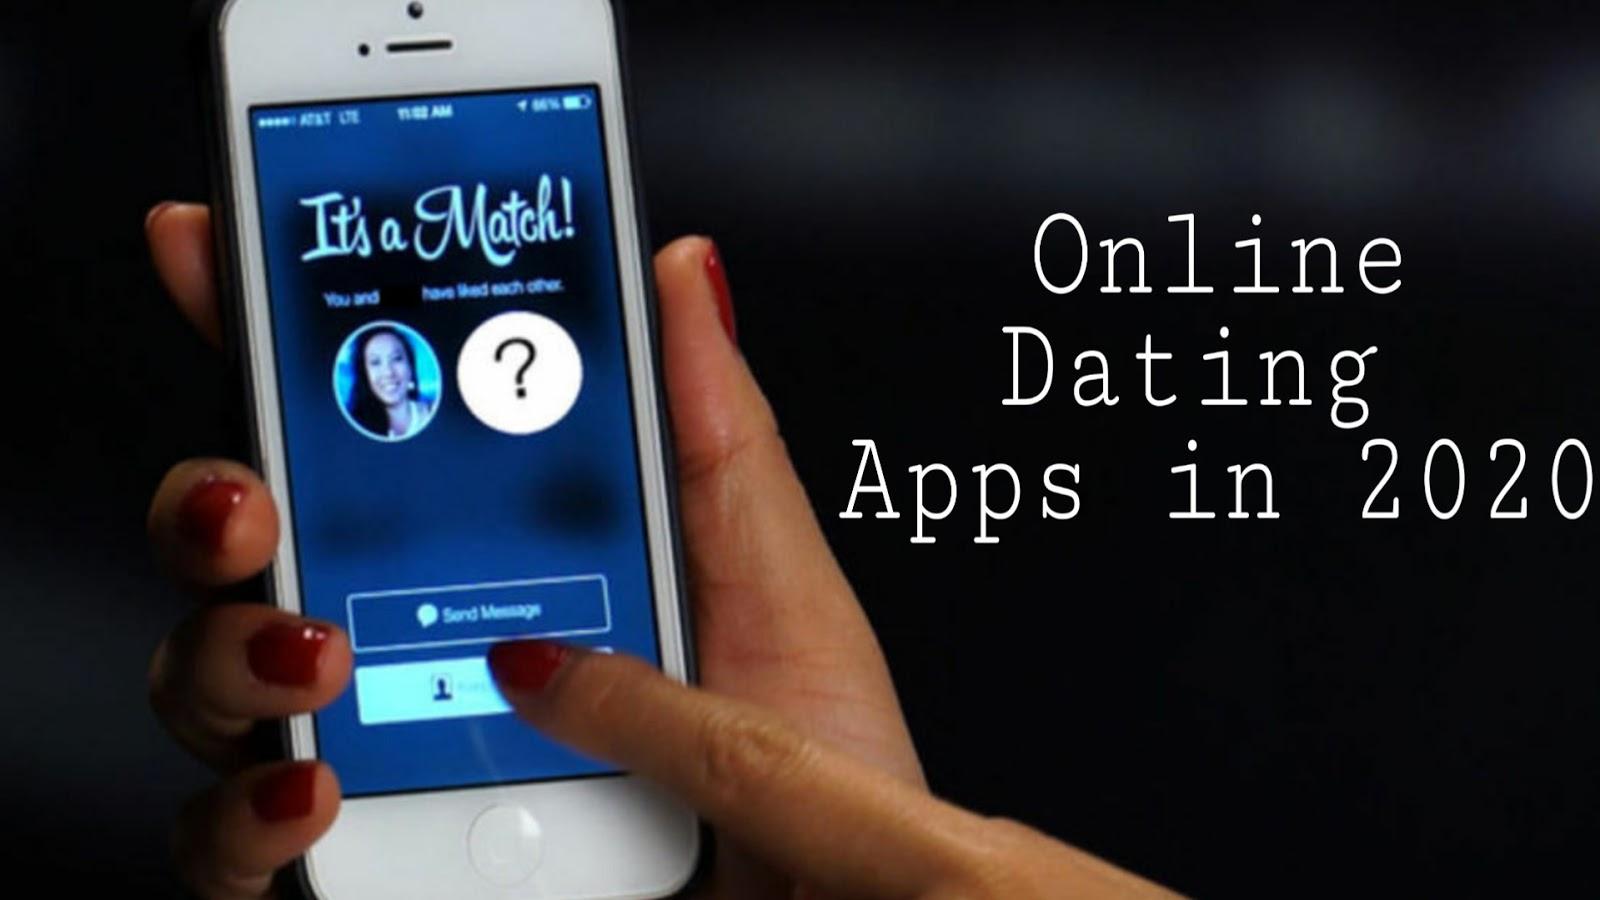 Top 5 Best Online dating apps in India